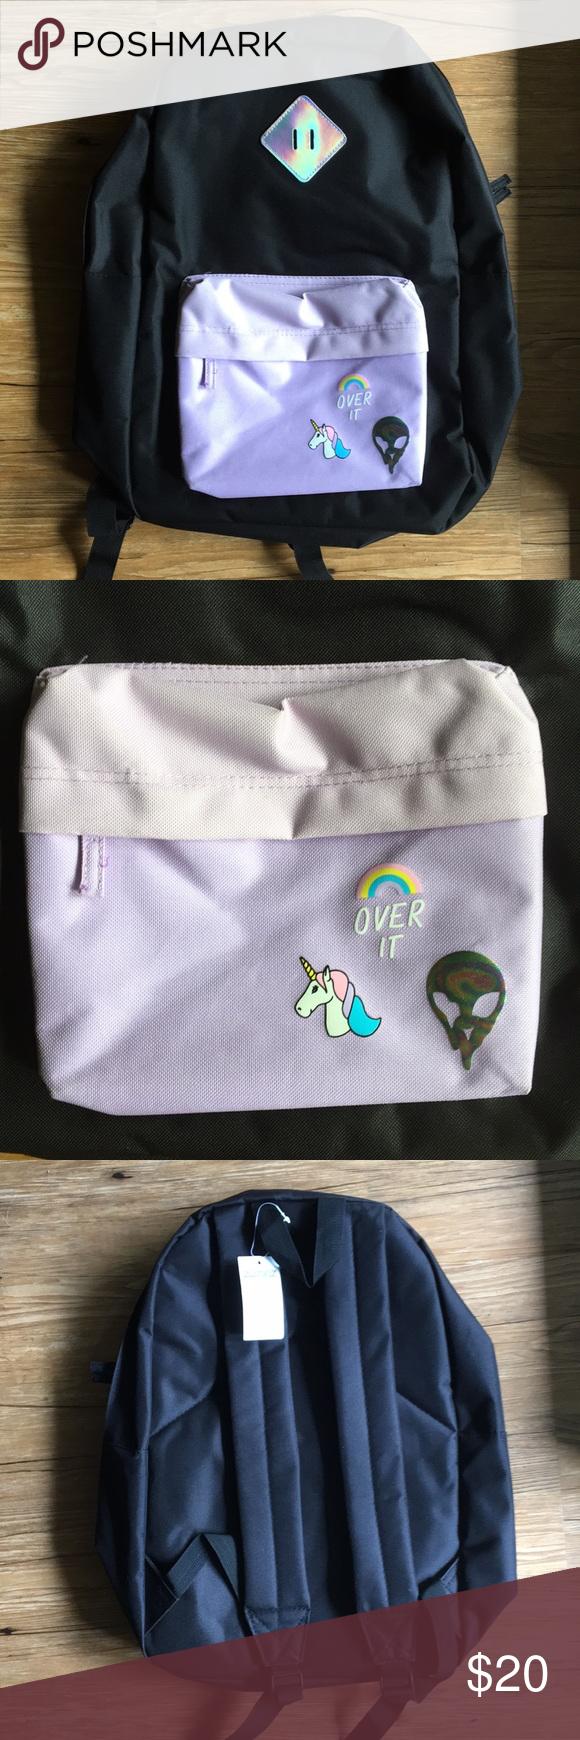 Nwt empyre zumiez black pastel kawaii backpack nwt my posh picks